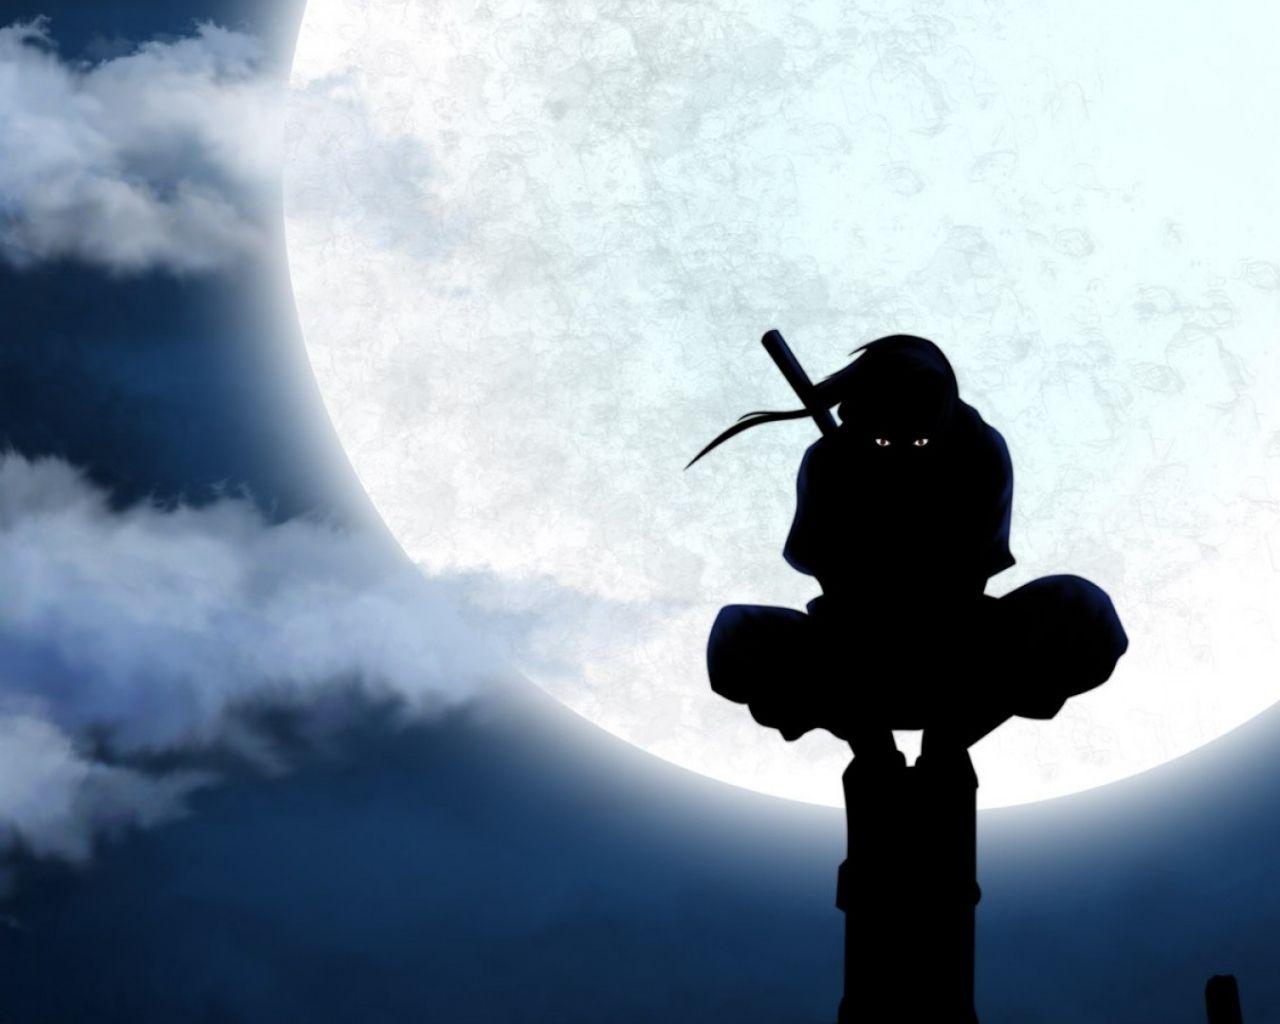 moon silhouette naruto shippuden uchiha itachi anime ninja